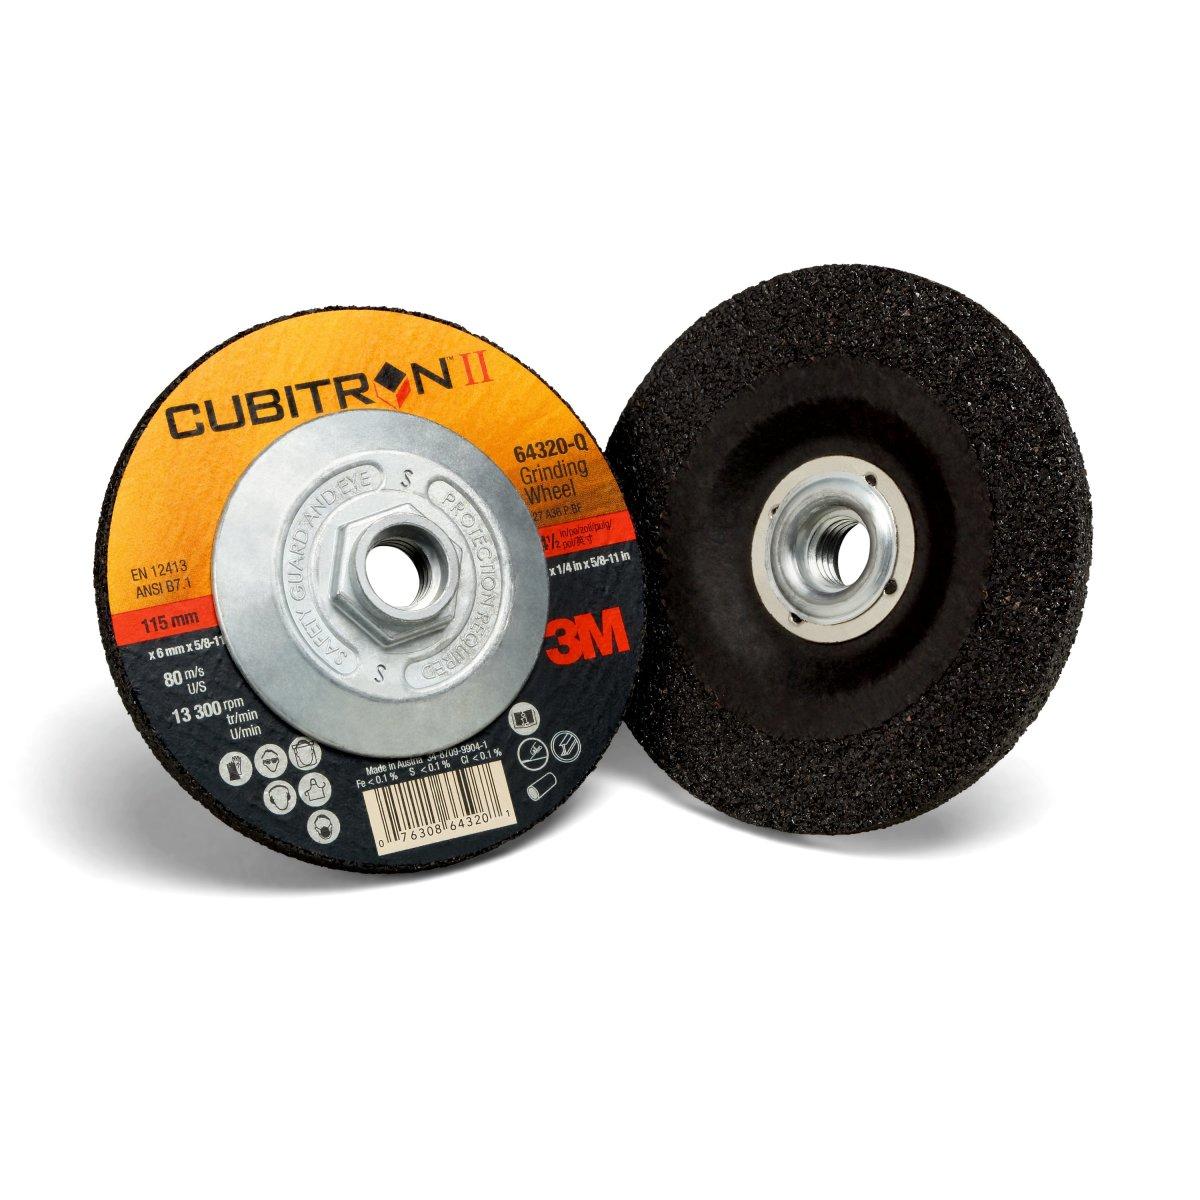 Cubitron II 64403 3M Flap Disc 969F T27 4-1//2 x 5//8-11 40+ YF-Weight Polyester Film Backing Precision Shaped Ceramic Grain Abrasive Grit 4.5 Diameter Giant